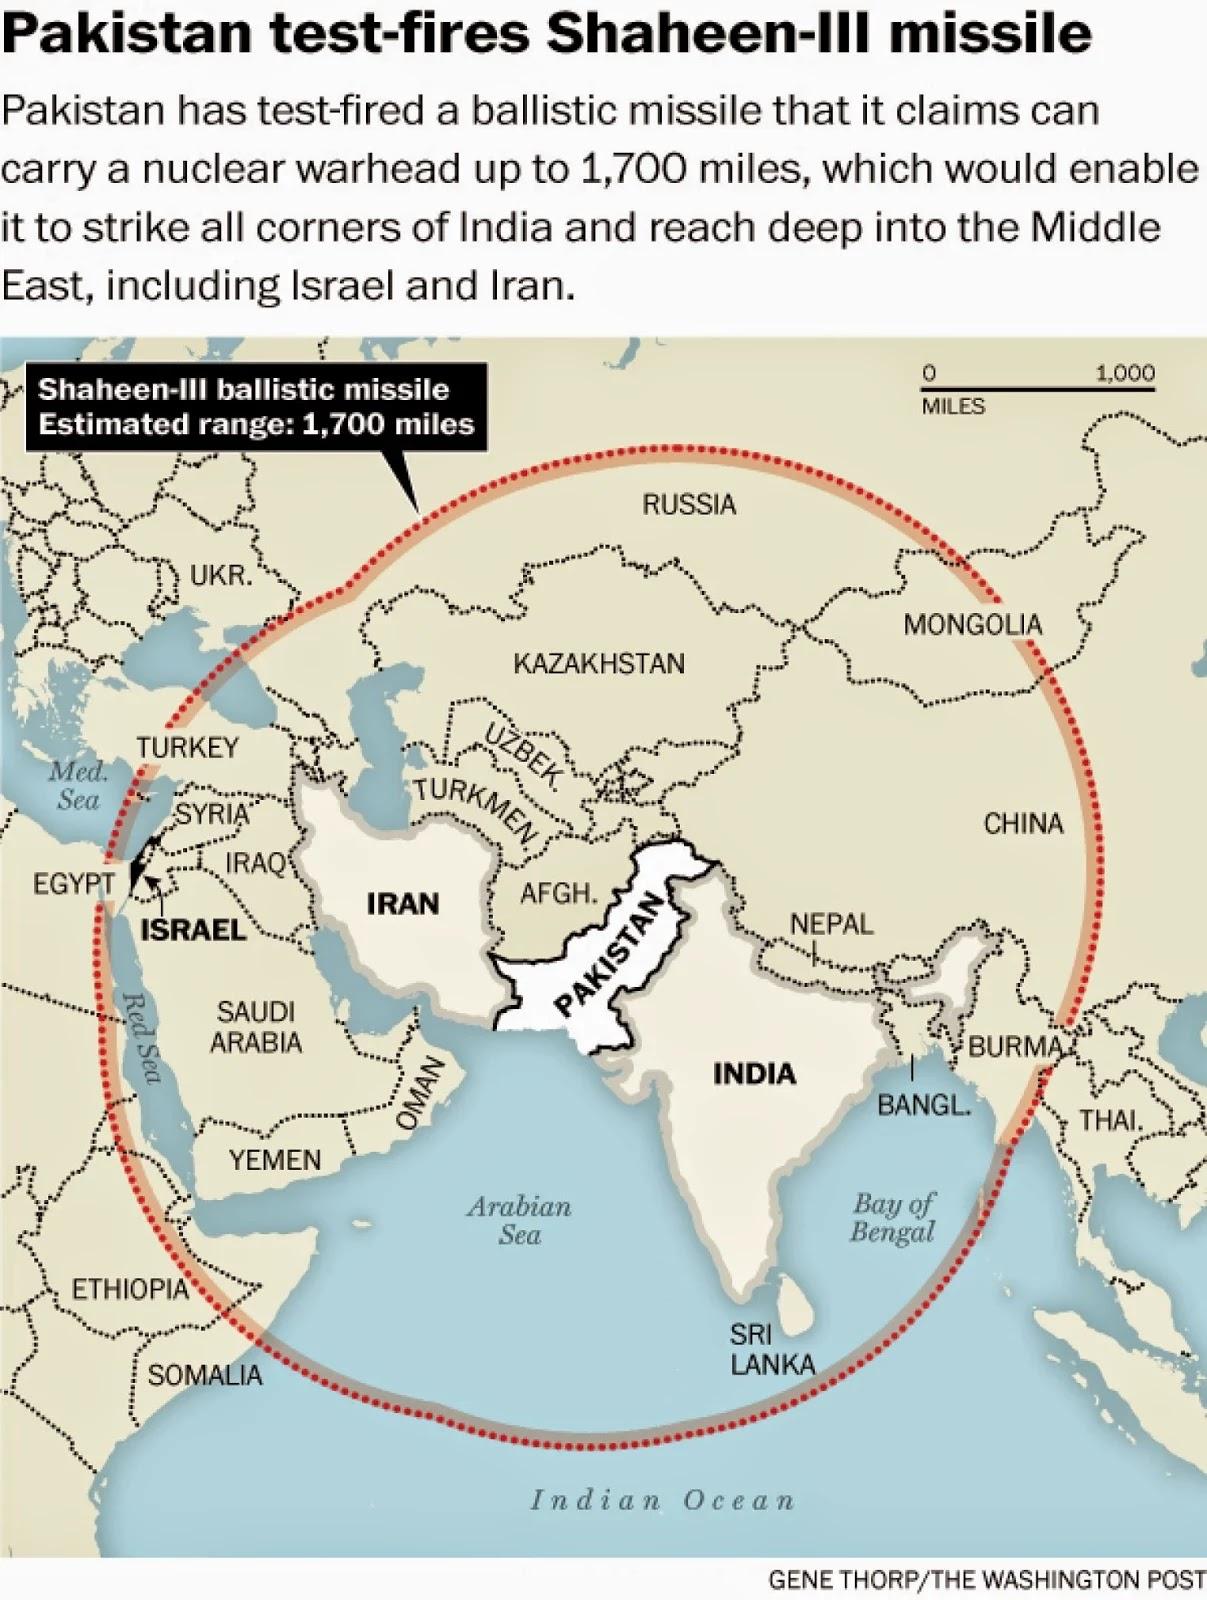 Haq's Musings: Pakistan's Shaheen III Can Serve as SLV & Hit